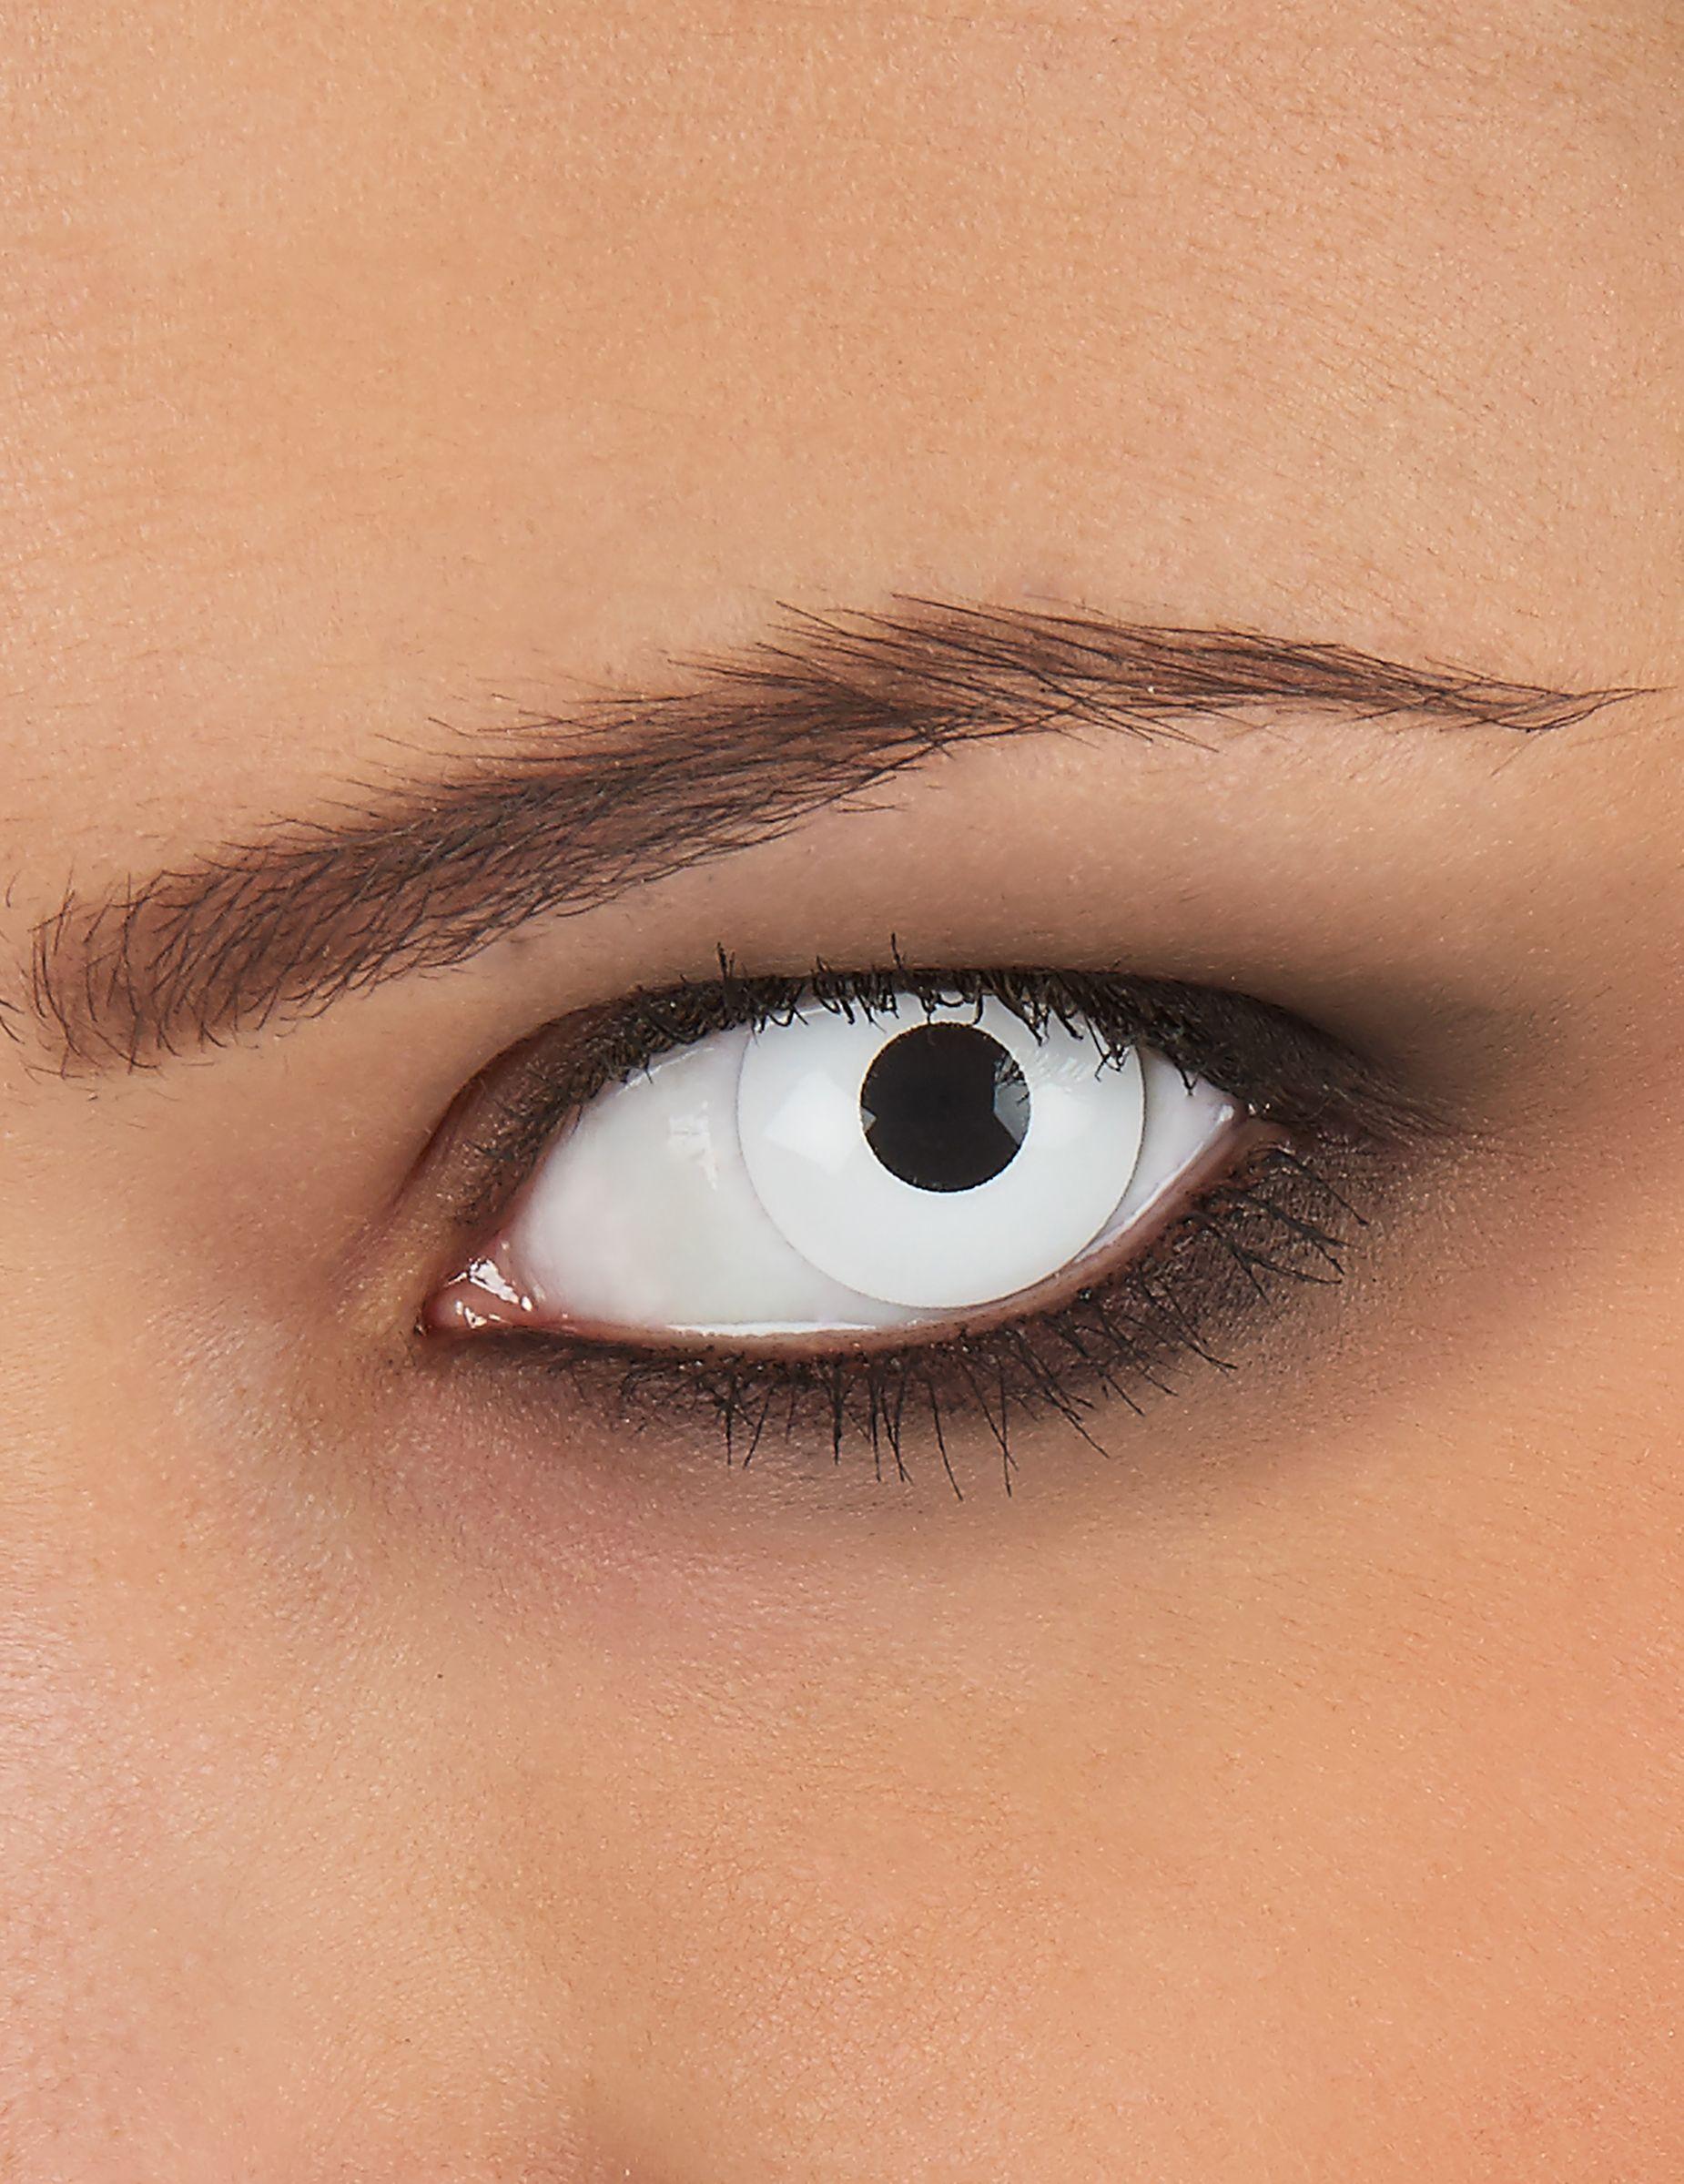 4b7fa89e84ab1 Lentillas de contacto ojo blanco  Estas lentillas de contacto de fantasía  para adulto son de color blanco. Miden 14.5 mm de diámetro.